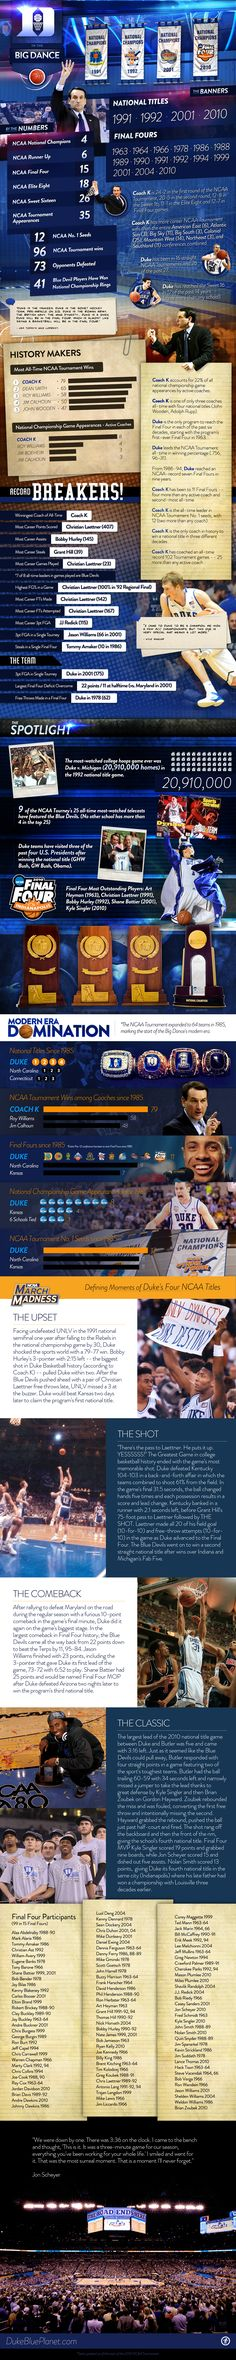 Duke as an infographic